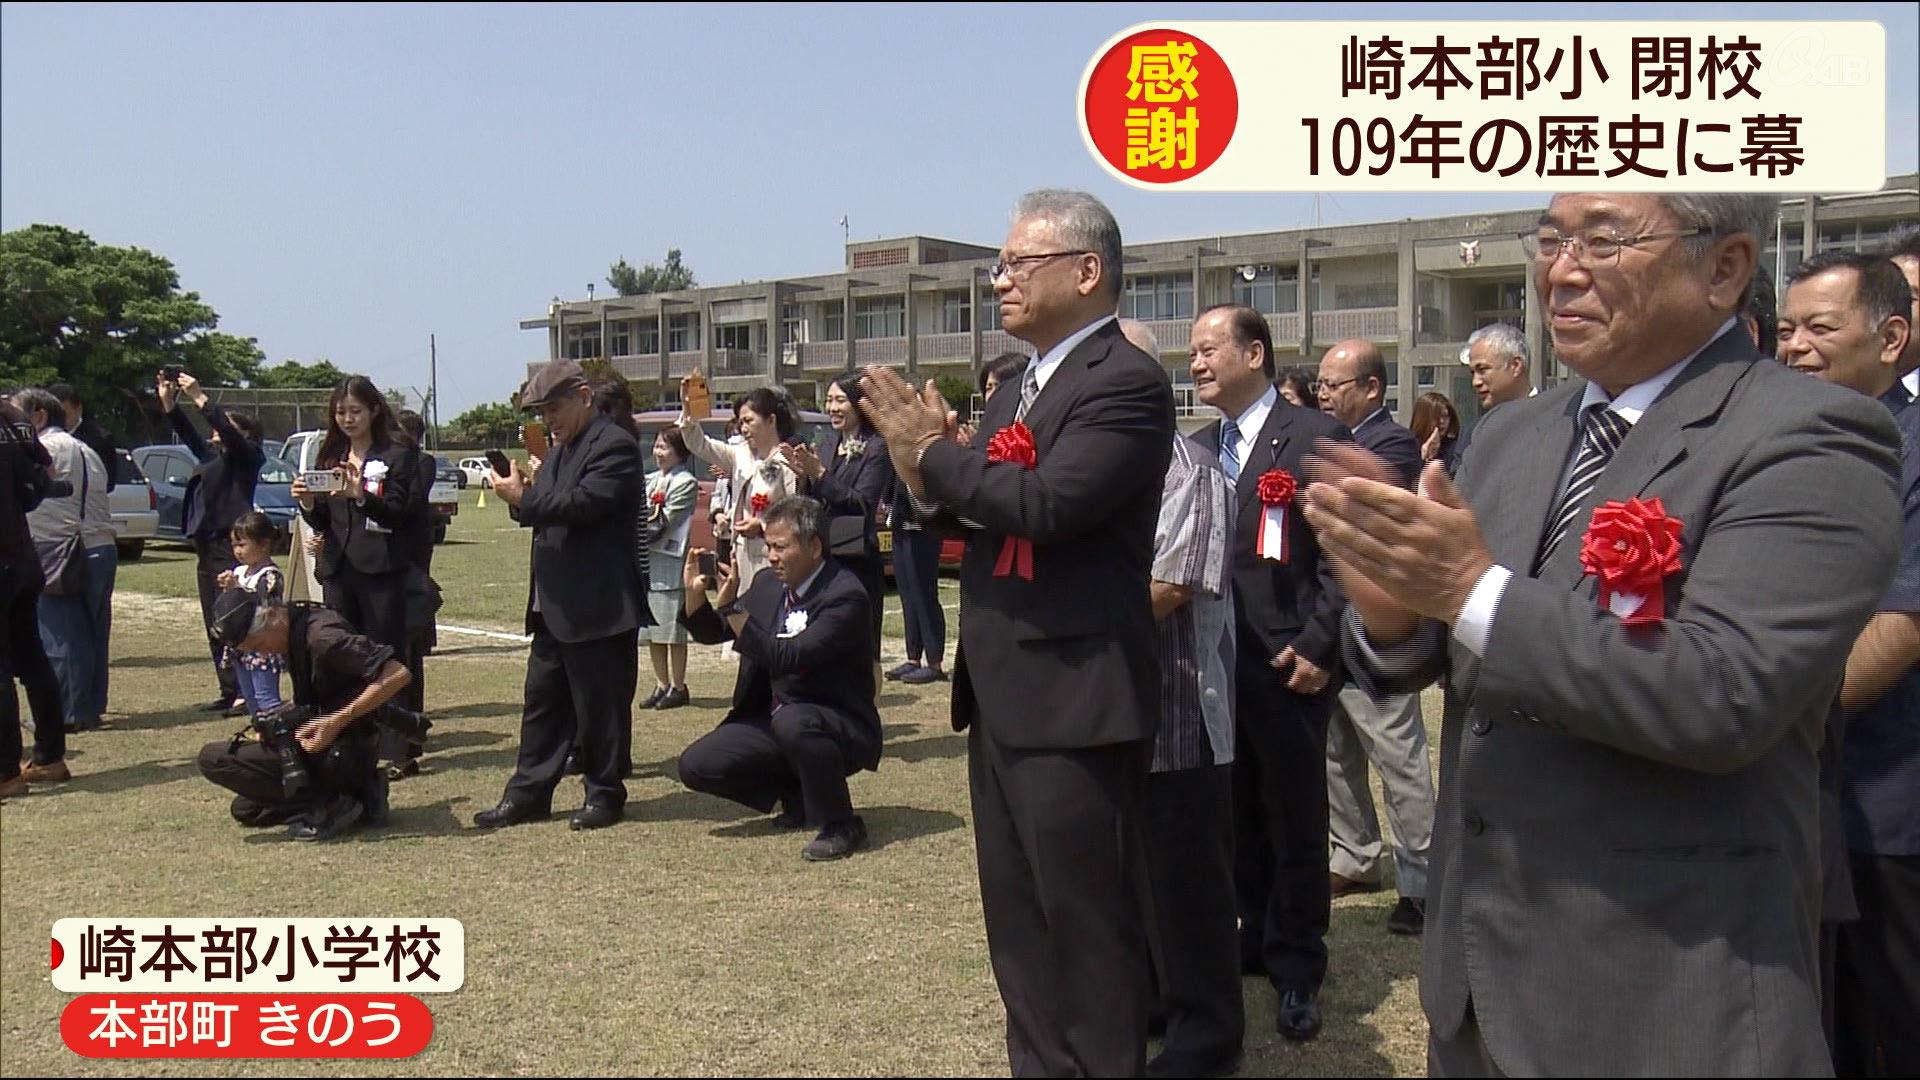 崎本部小学校109年の歴史に幕